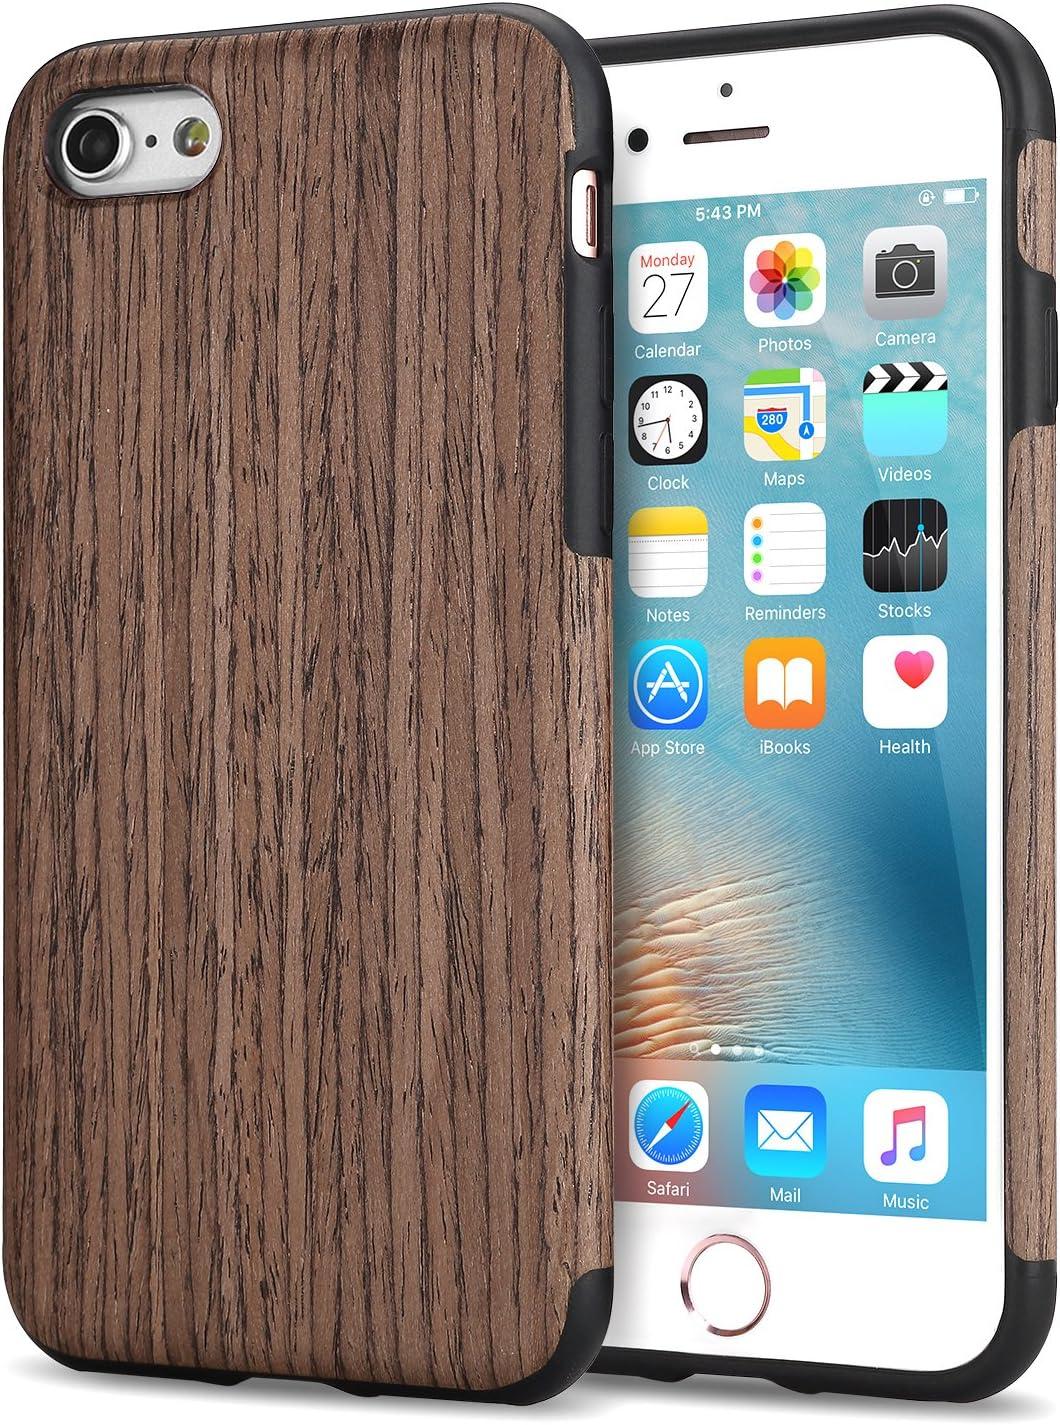 TENDLIN Funda iPhone 6s Grano de Madera Silicona TPU Híbrido Suave ...